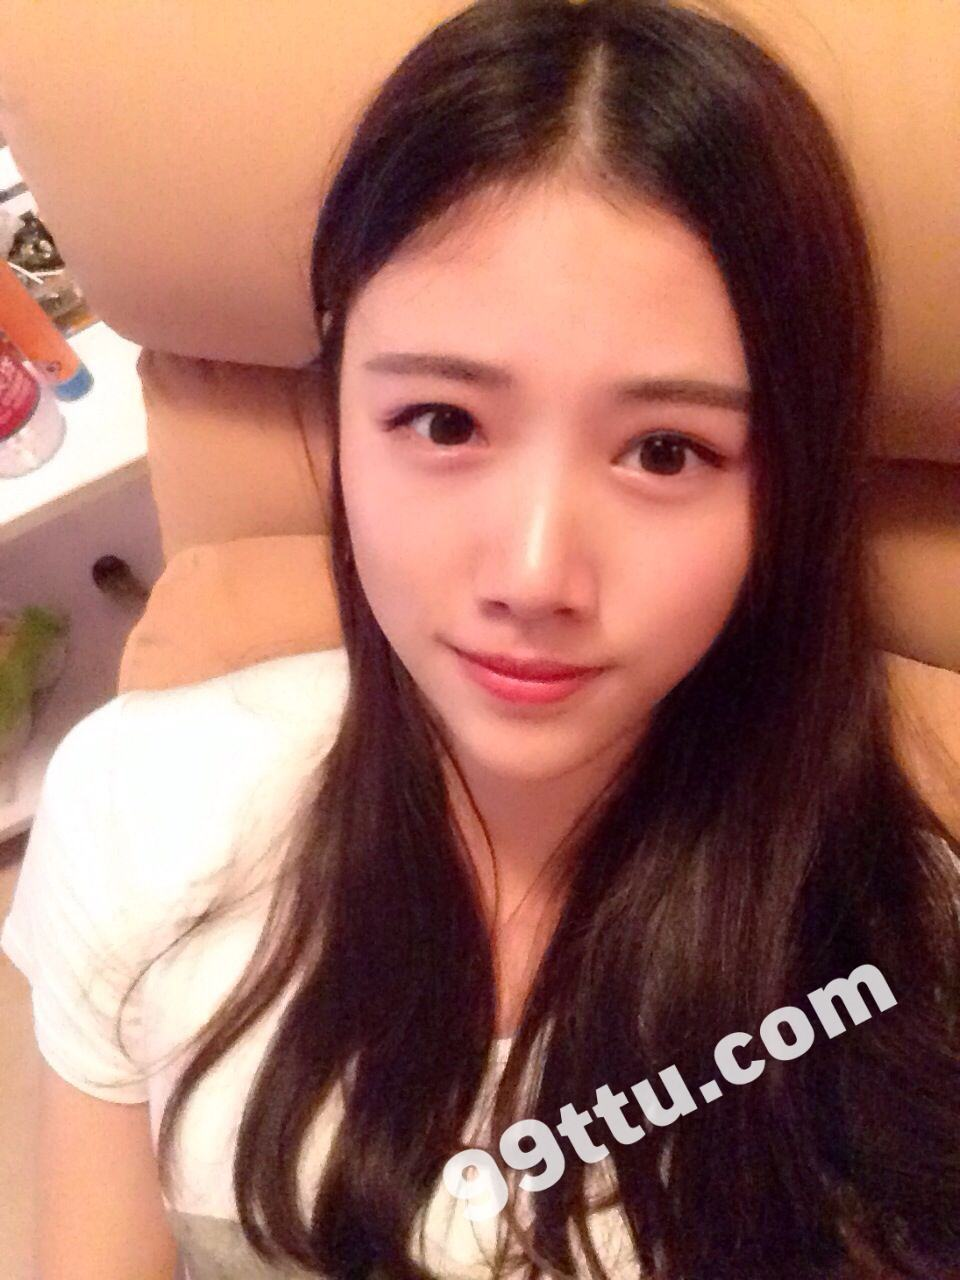 KK58_129张 真实美女时尚女神套图生活照-3